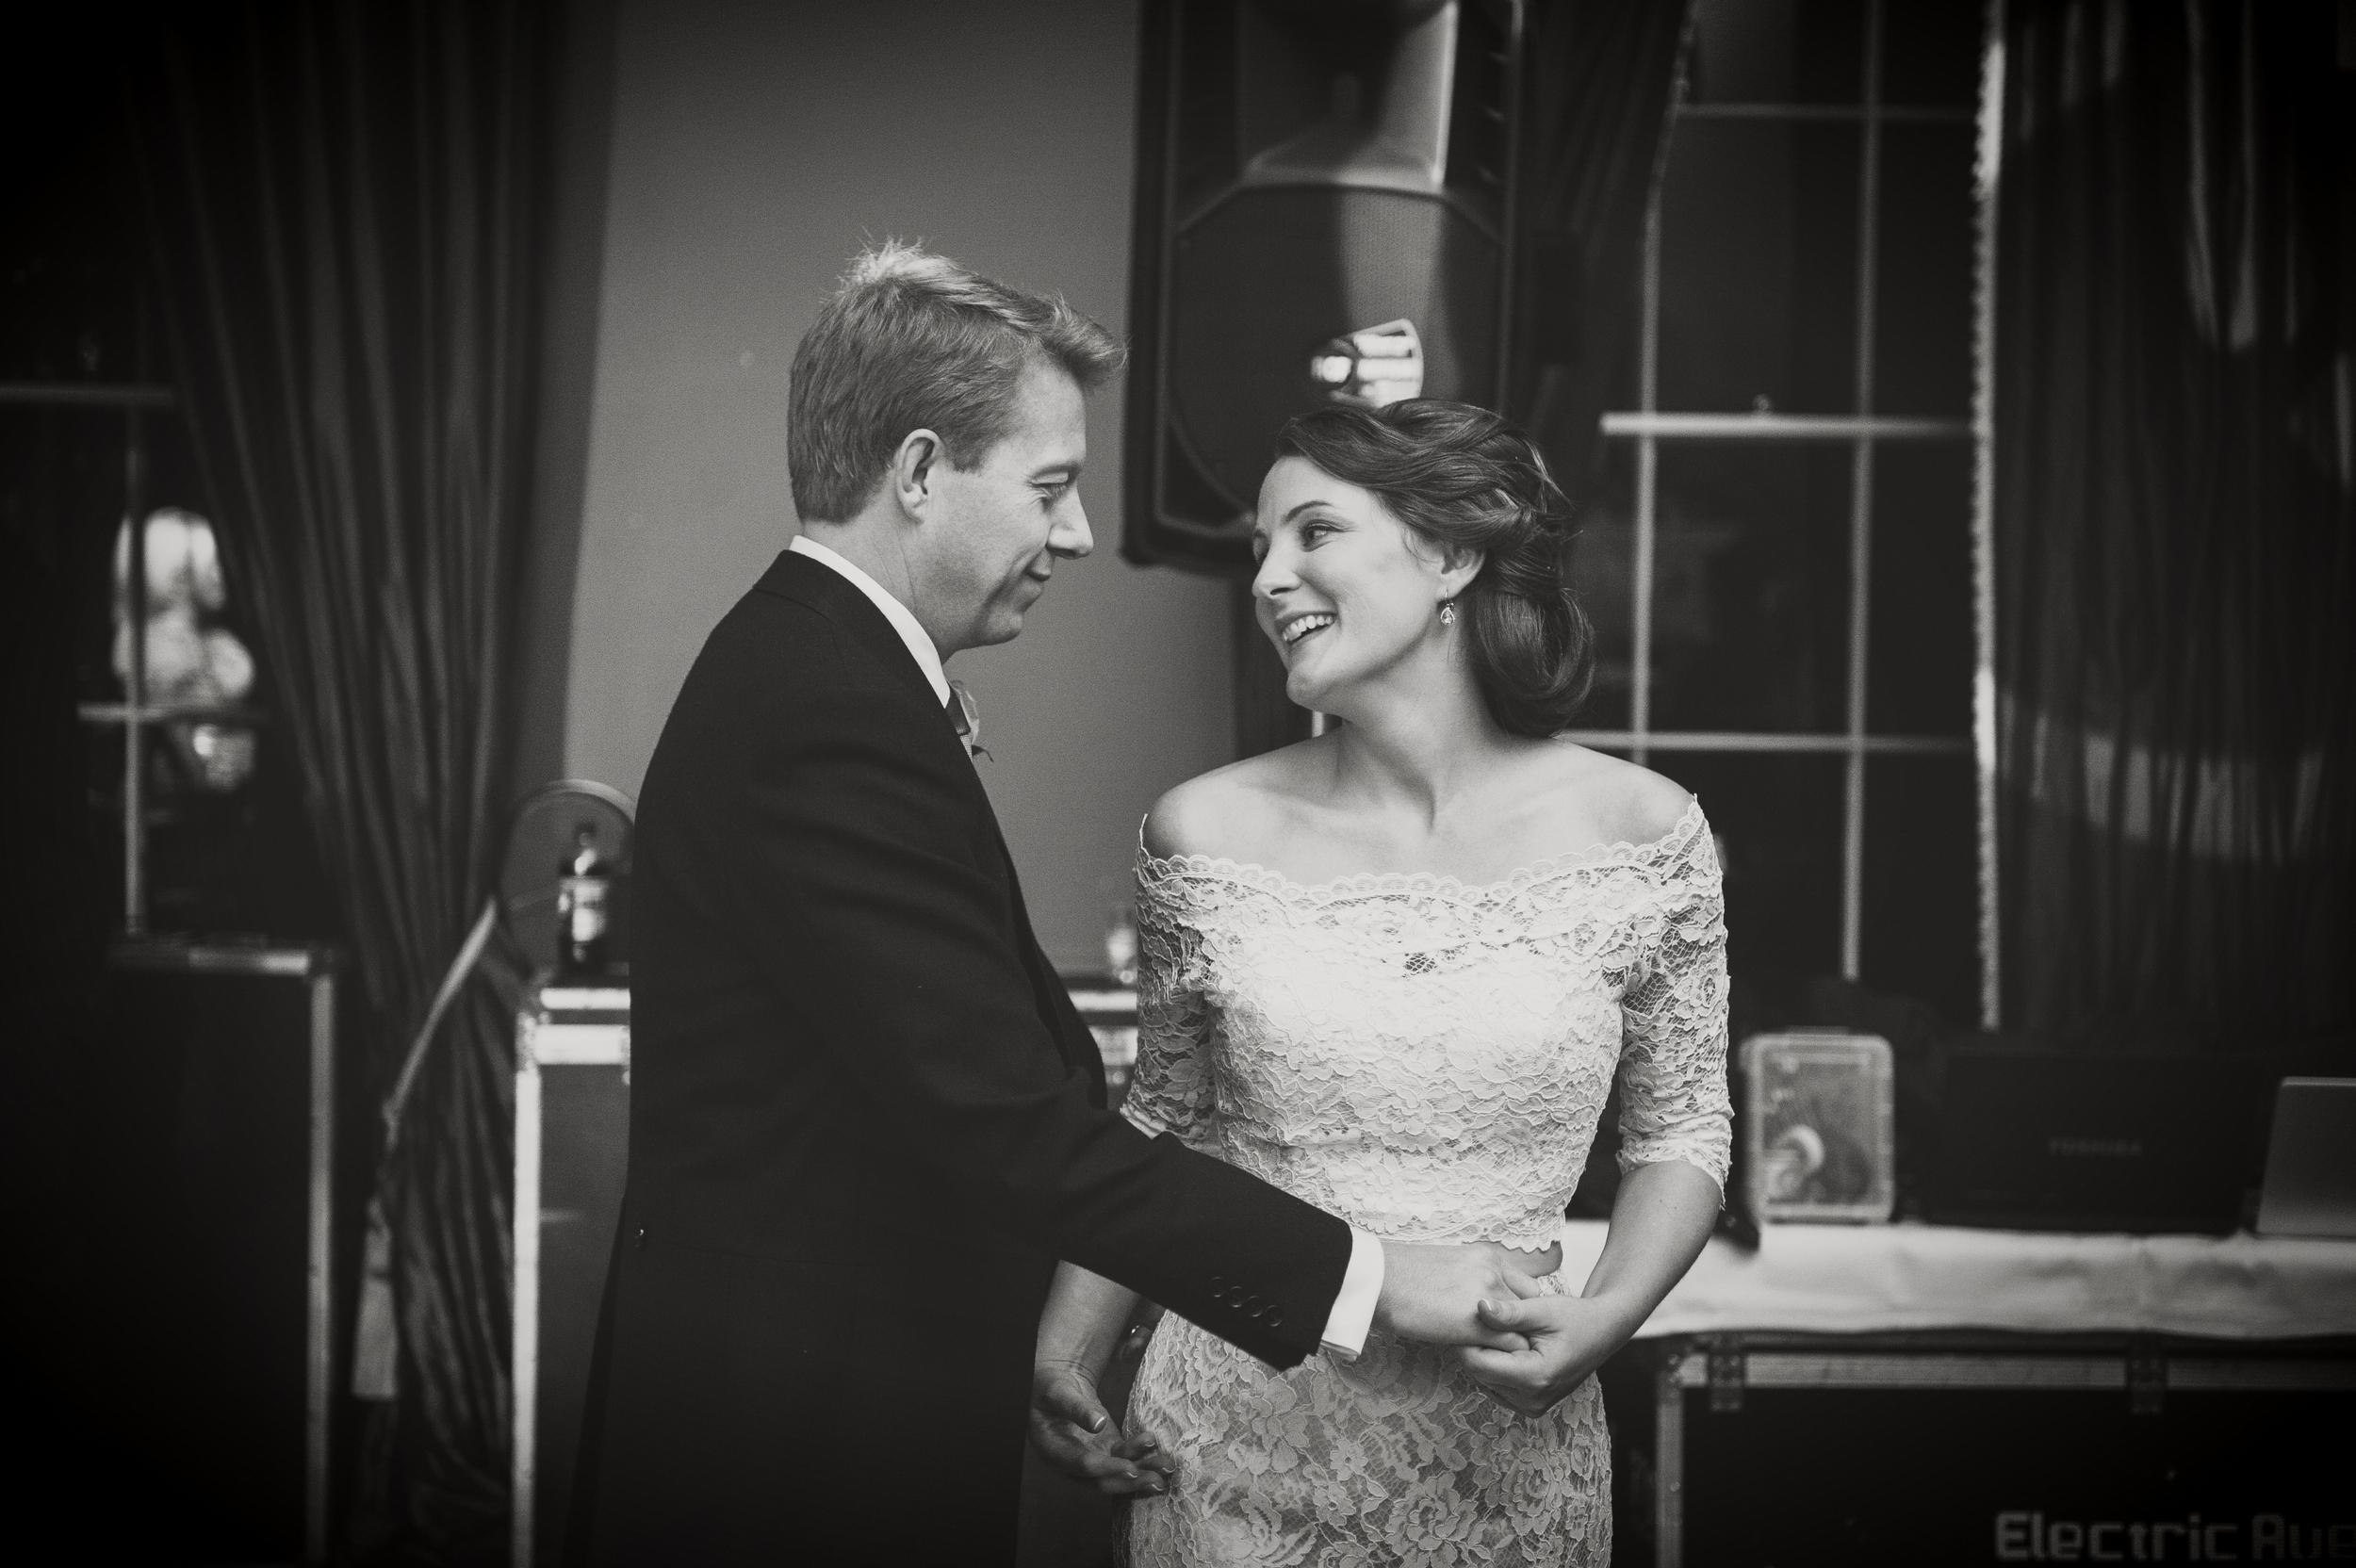 Carton_House_Wedding_Photography_Maynooth_Ireland_091.jpg